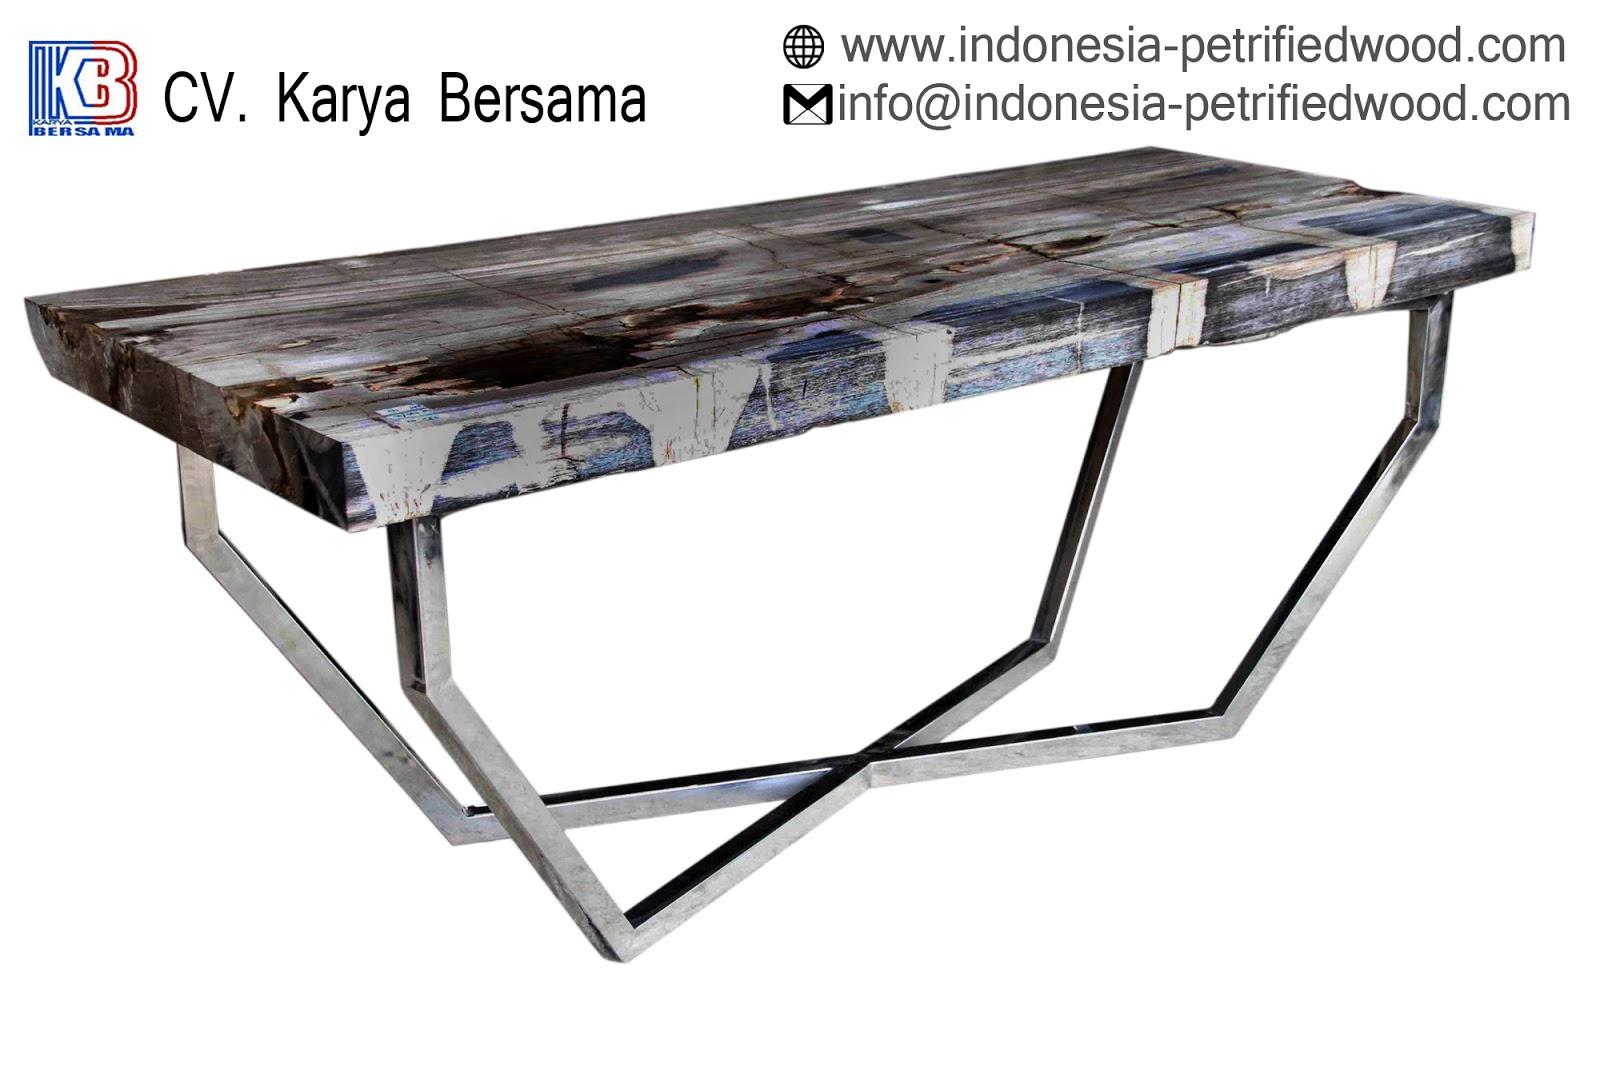 petrified wood coffee table | Petrified wood manufacture